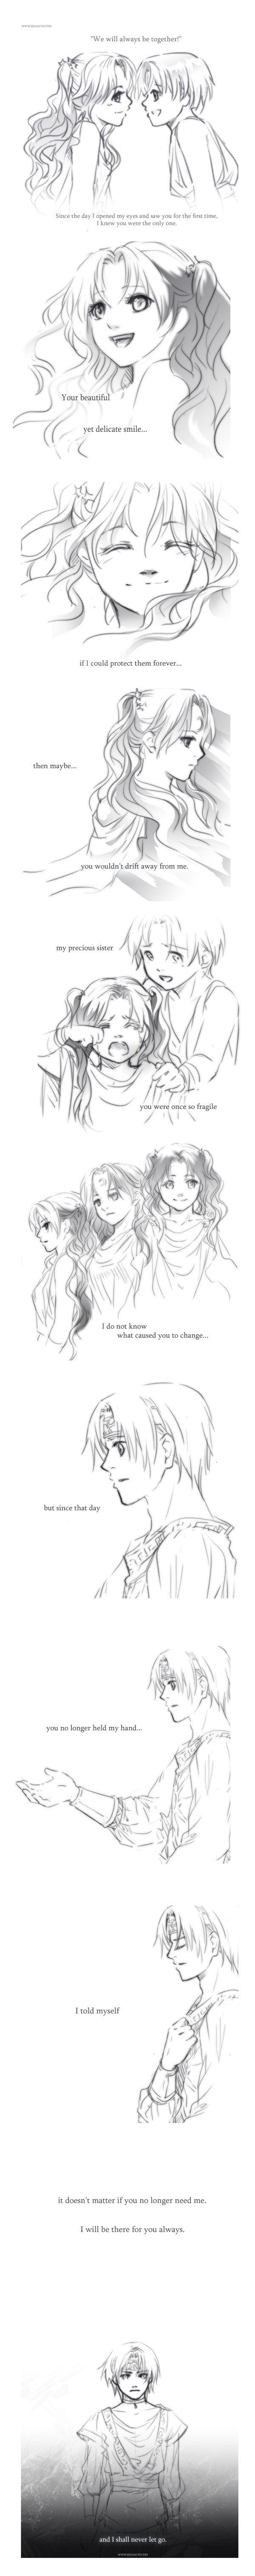 Tags: Anime, Zelda C. Wang, Apollo (Mythology), Artemis (Mythology), Greek Myths, deviantART